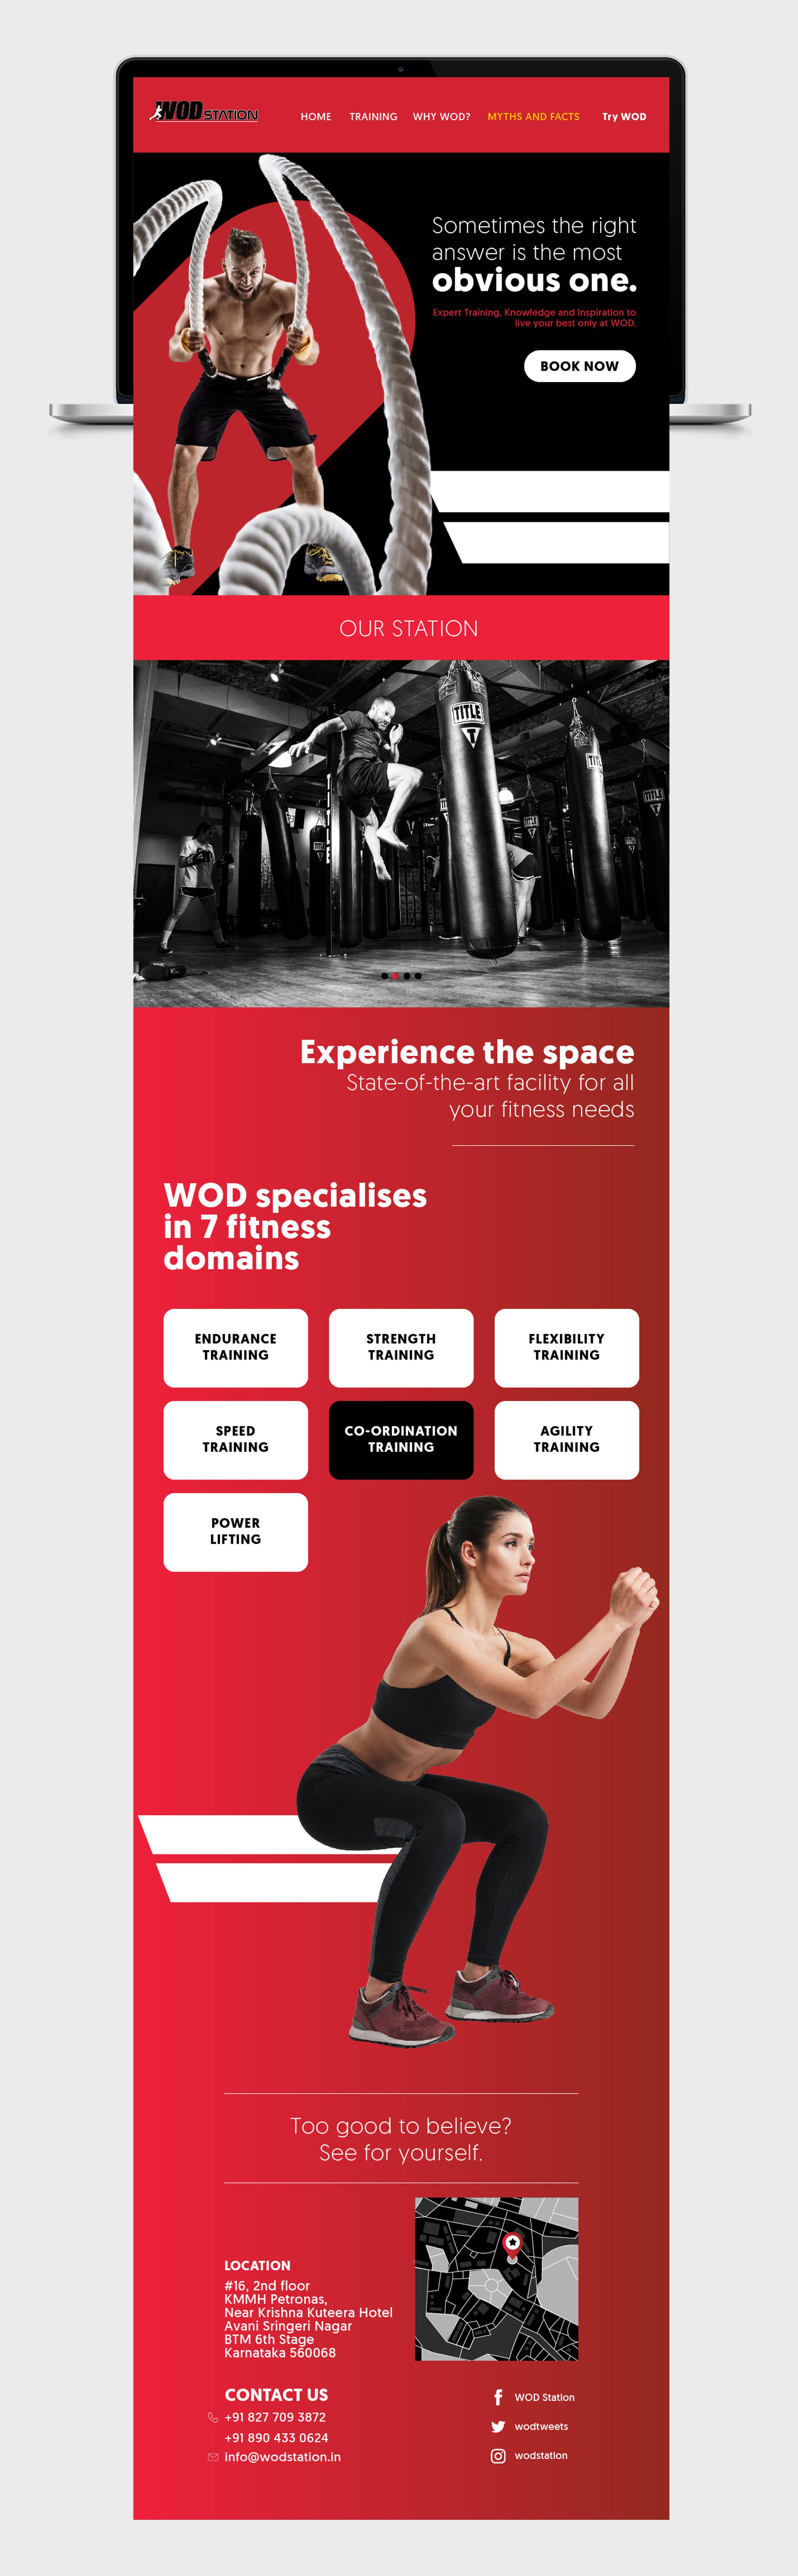 wod website.jpg